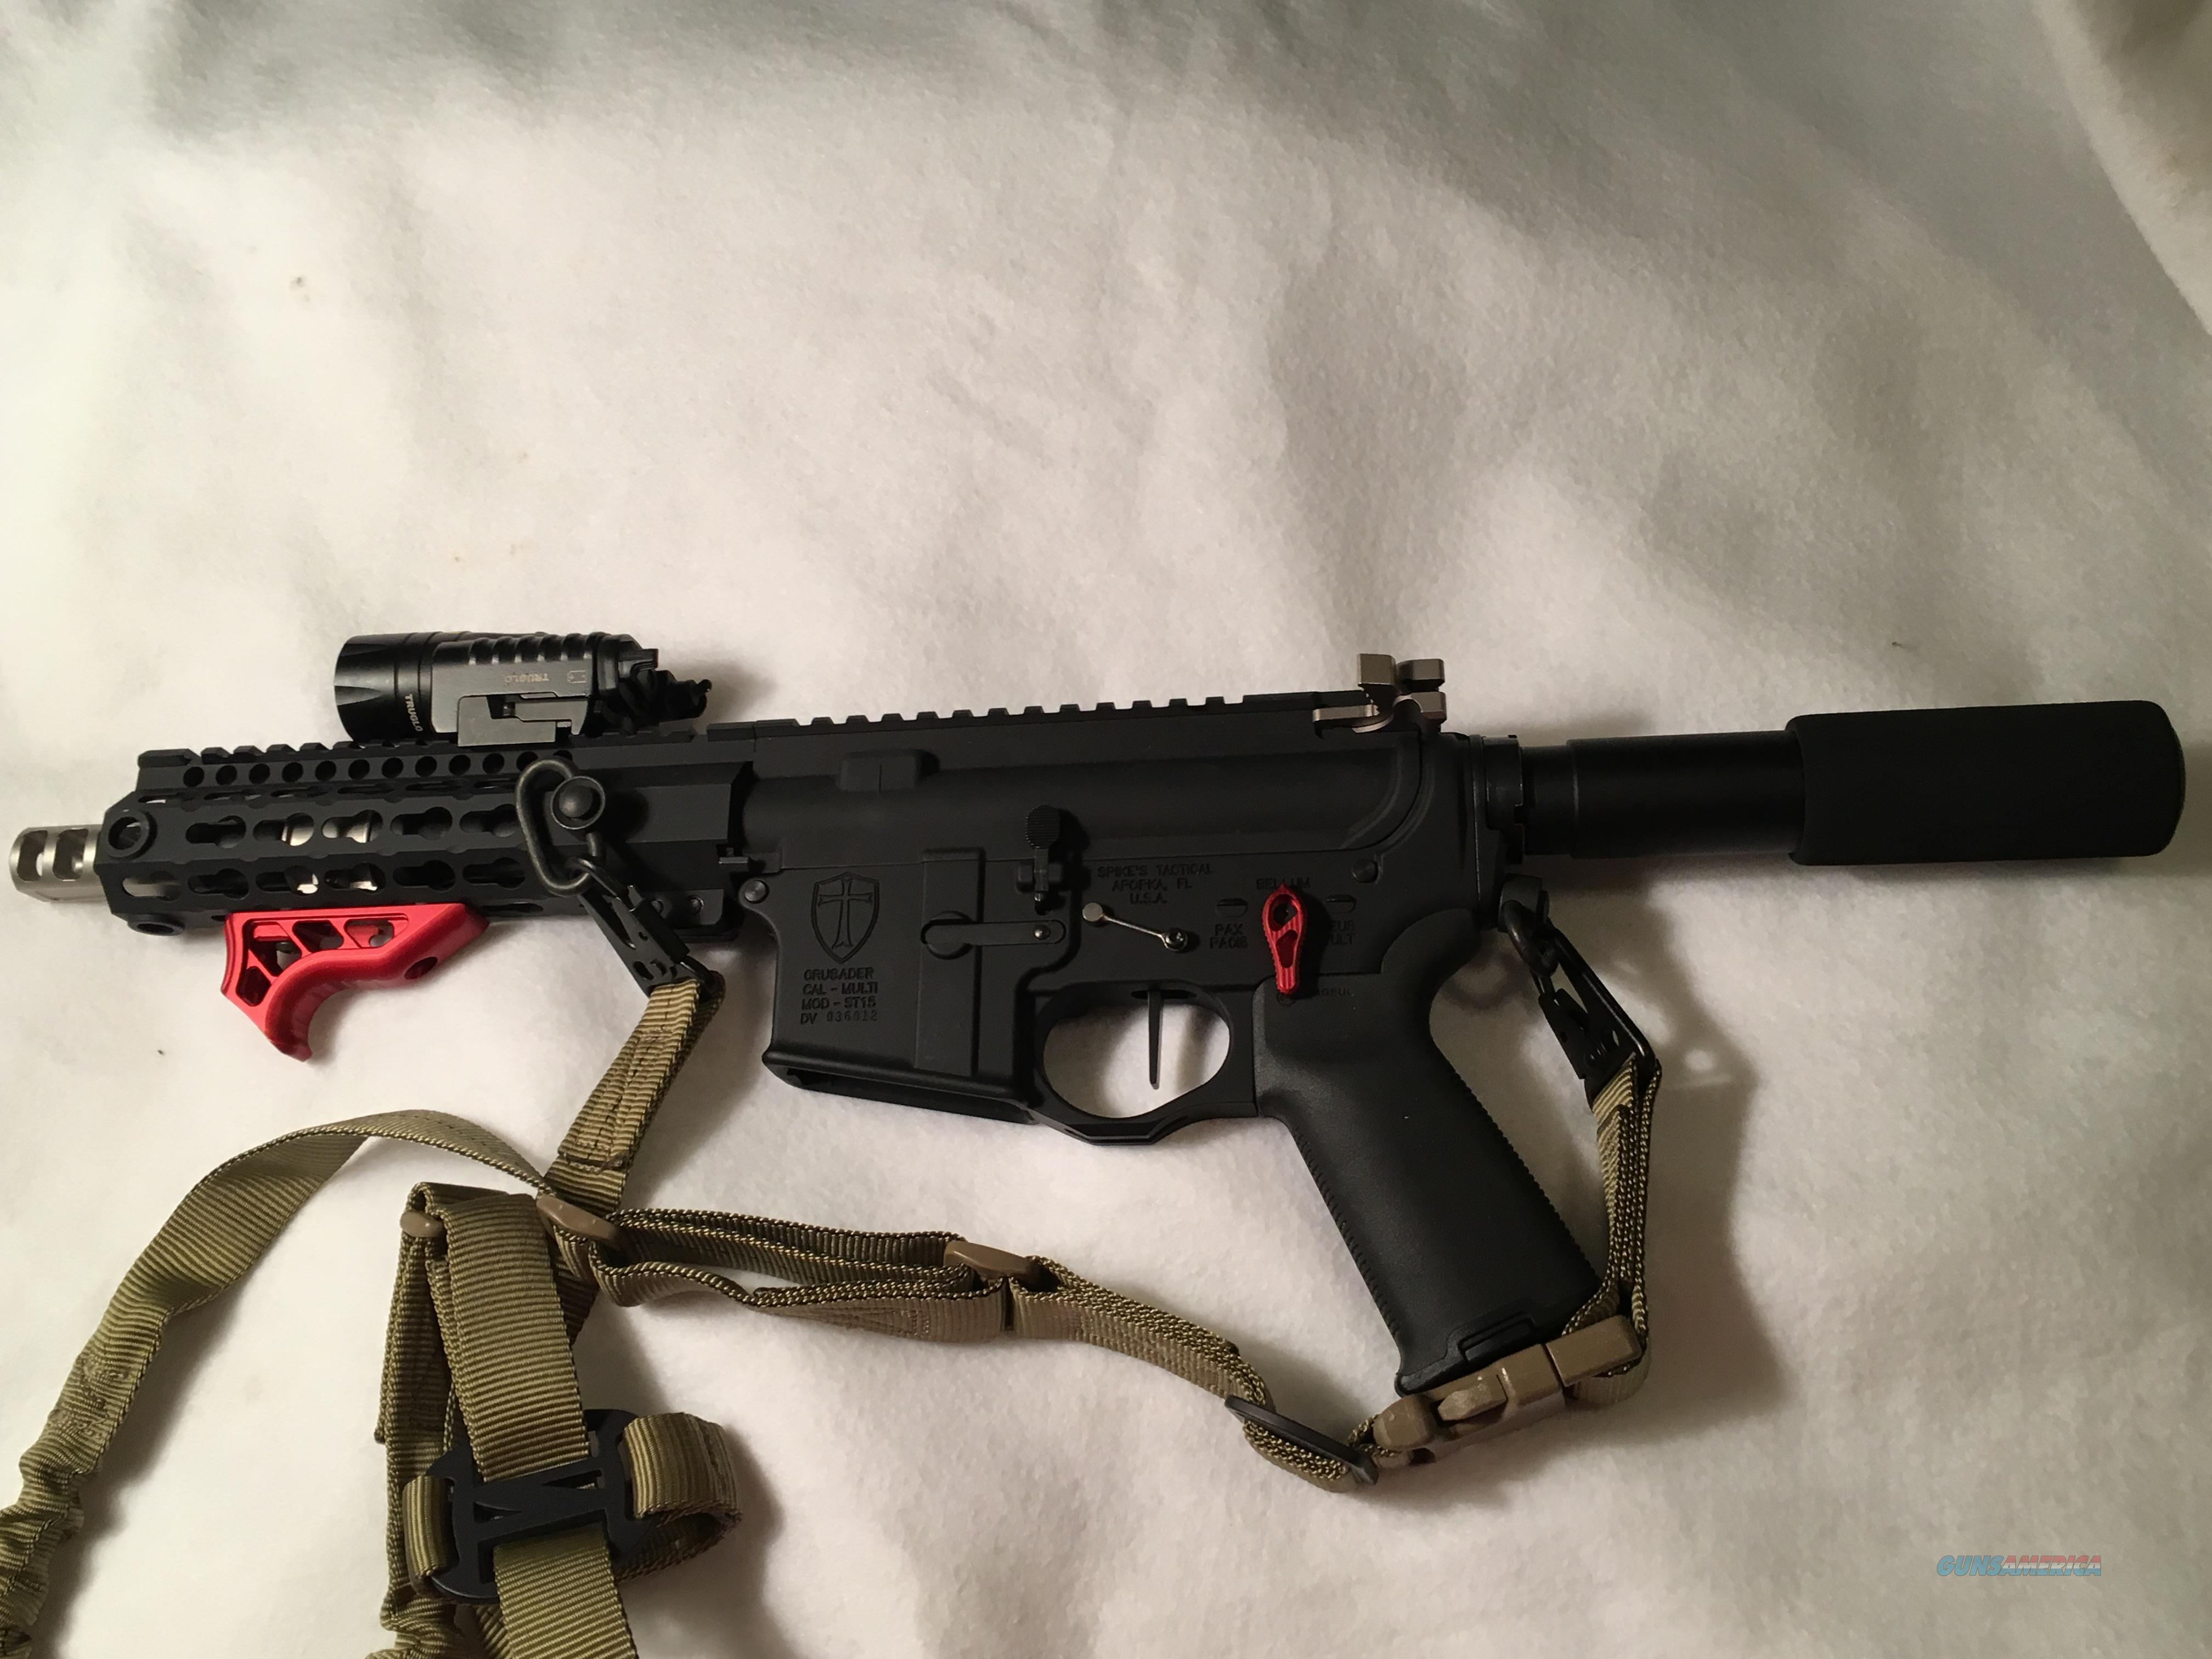 ENHANCED SPIKES TACTICAL CRUSADER PISTOL  Guns > Rifles > Spikes Tactical Rifles